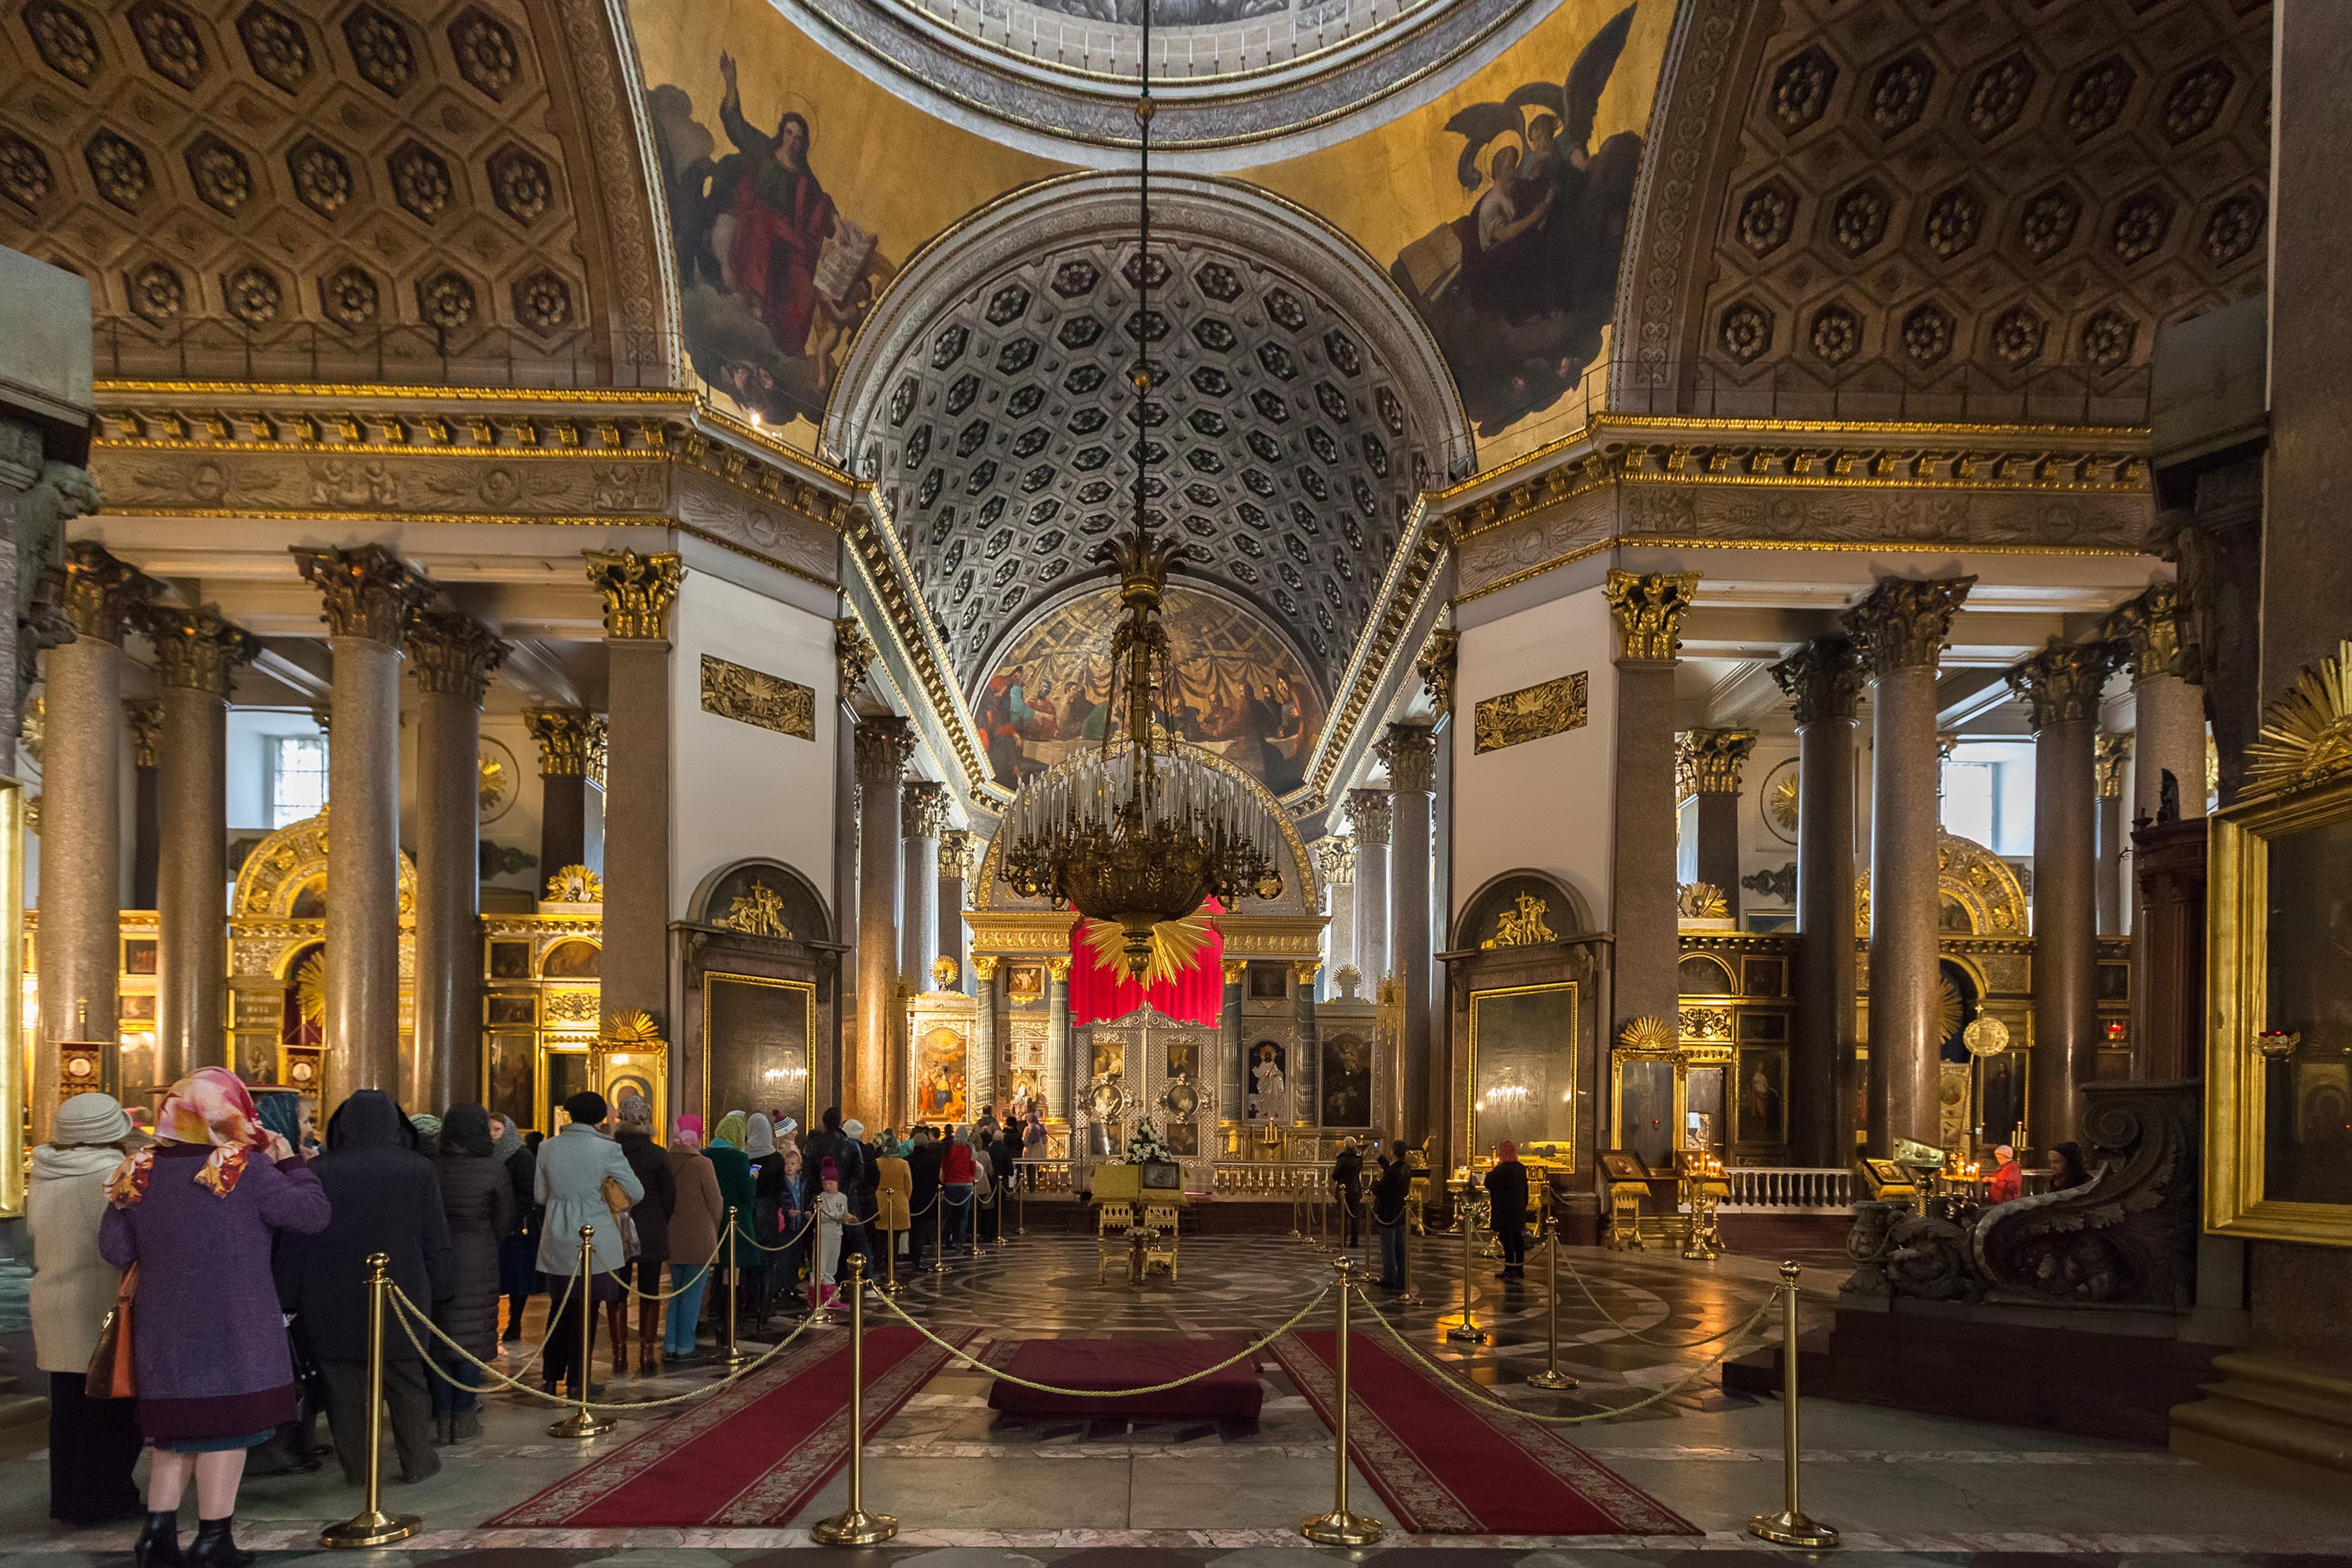 Dreamstime © - Saint-Pétersbourg - Cathédrale de Kazan (8).jpg